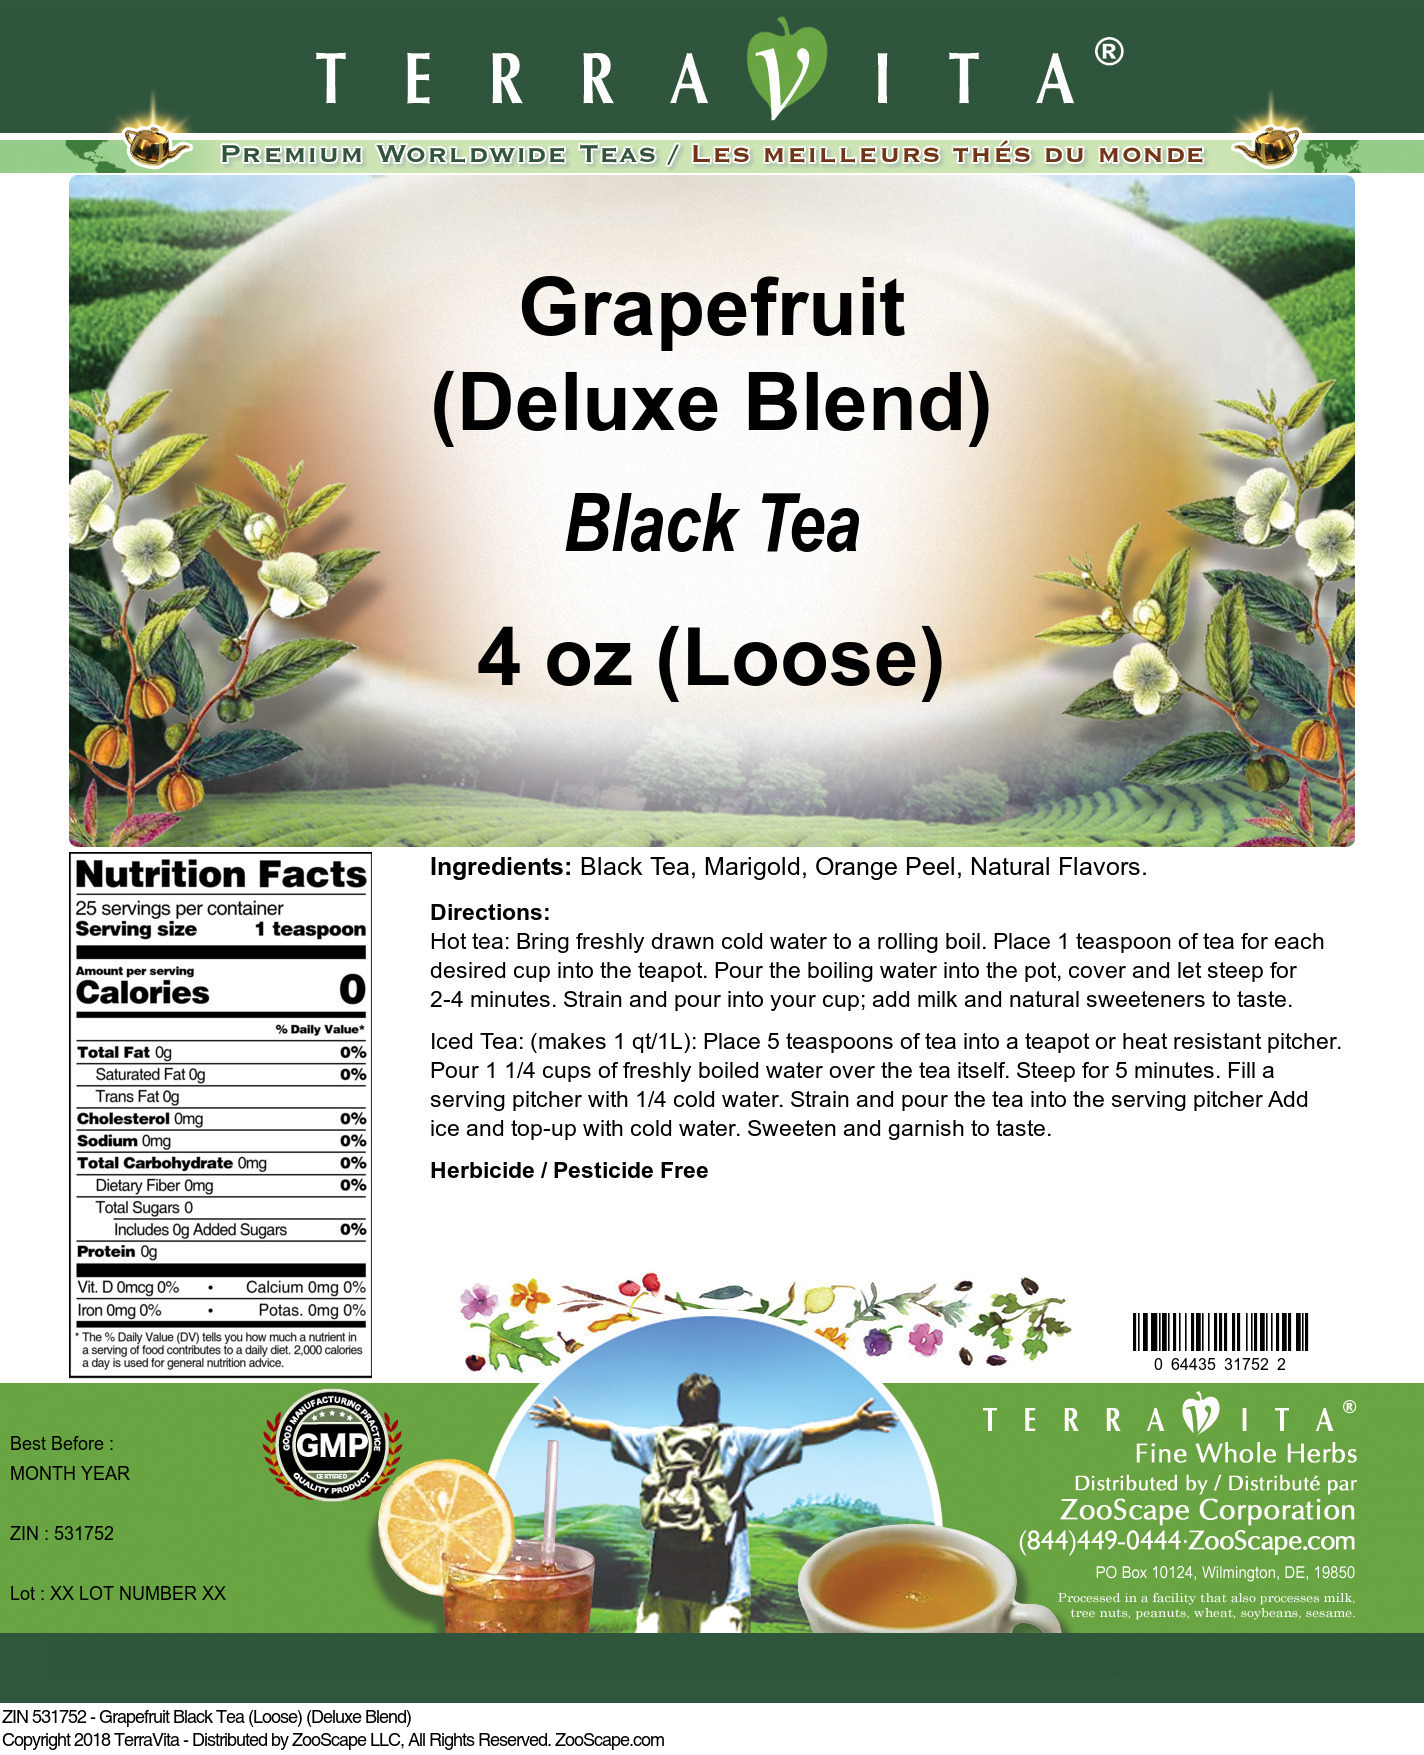 Grapefruit Black Tea (Loose) (Deluxe Blend)